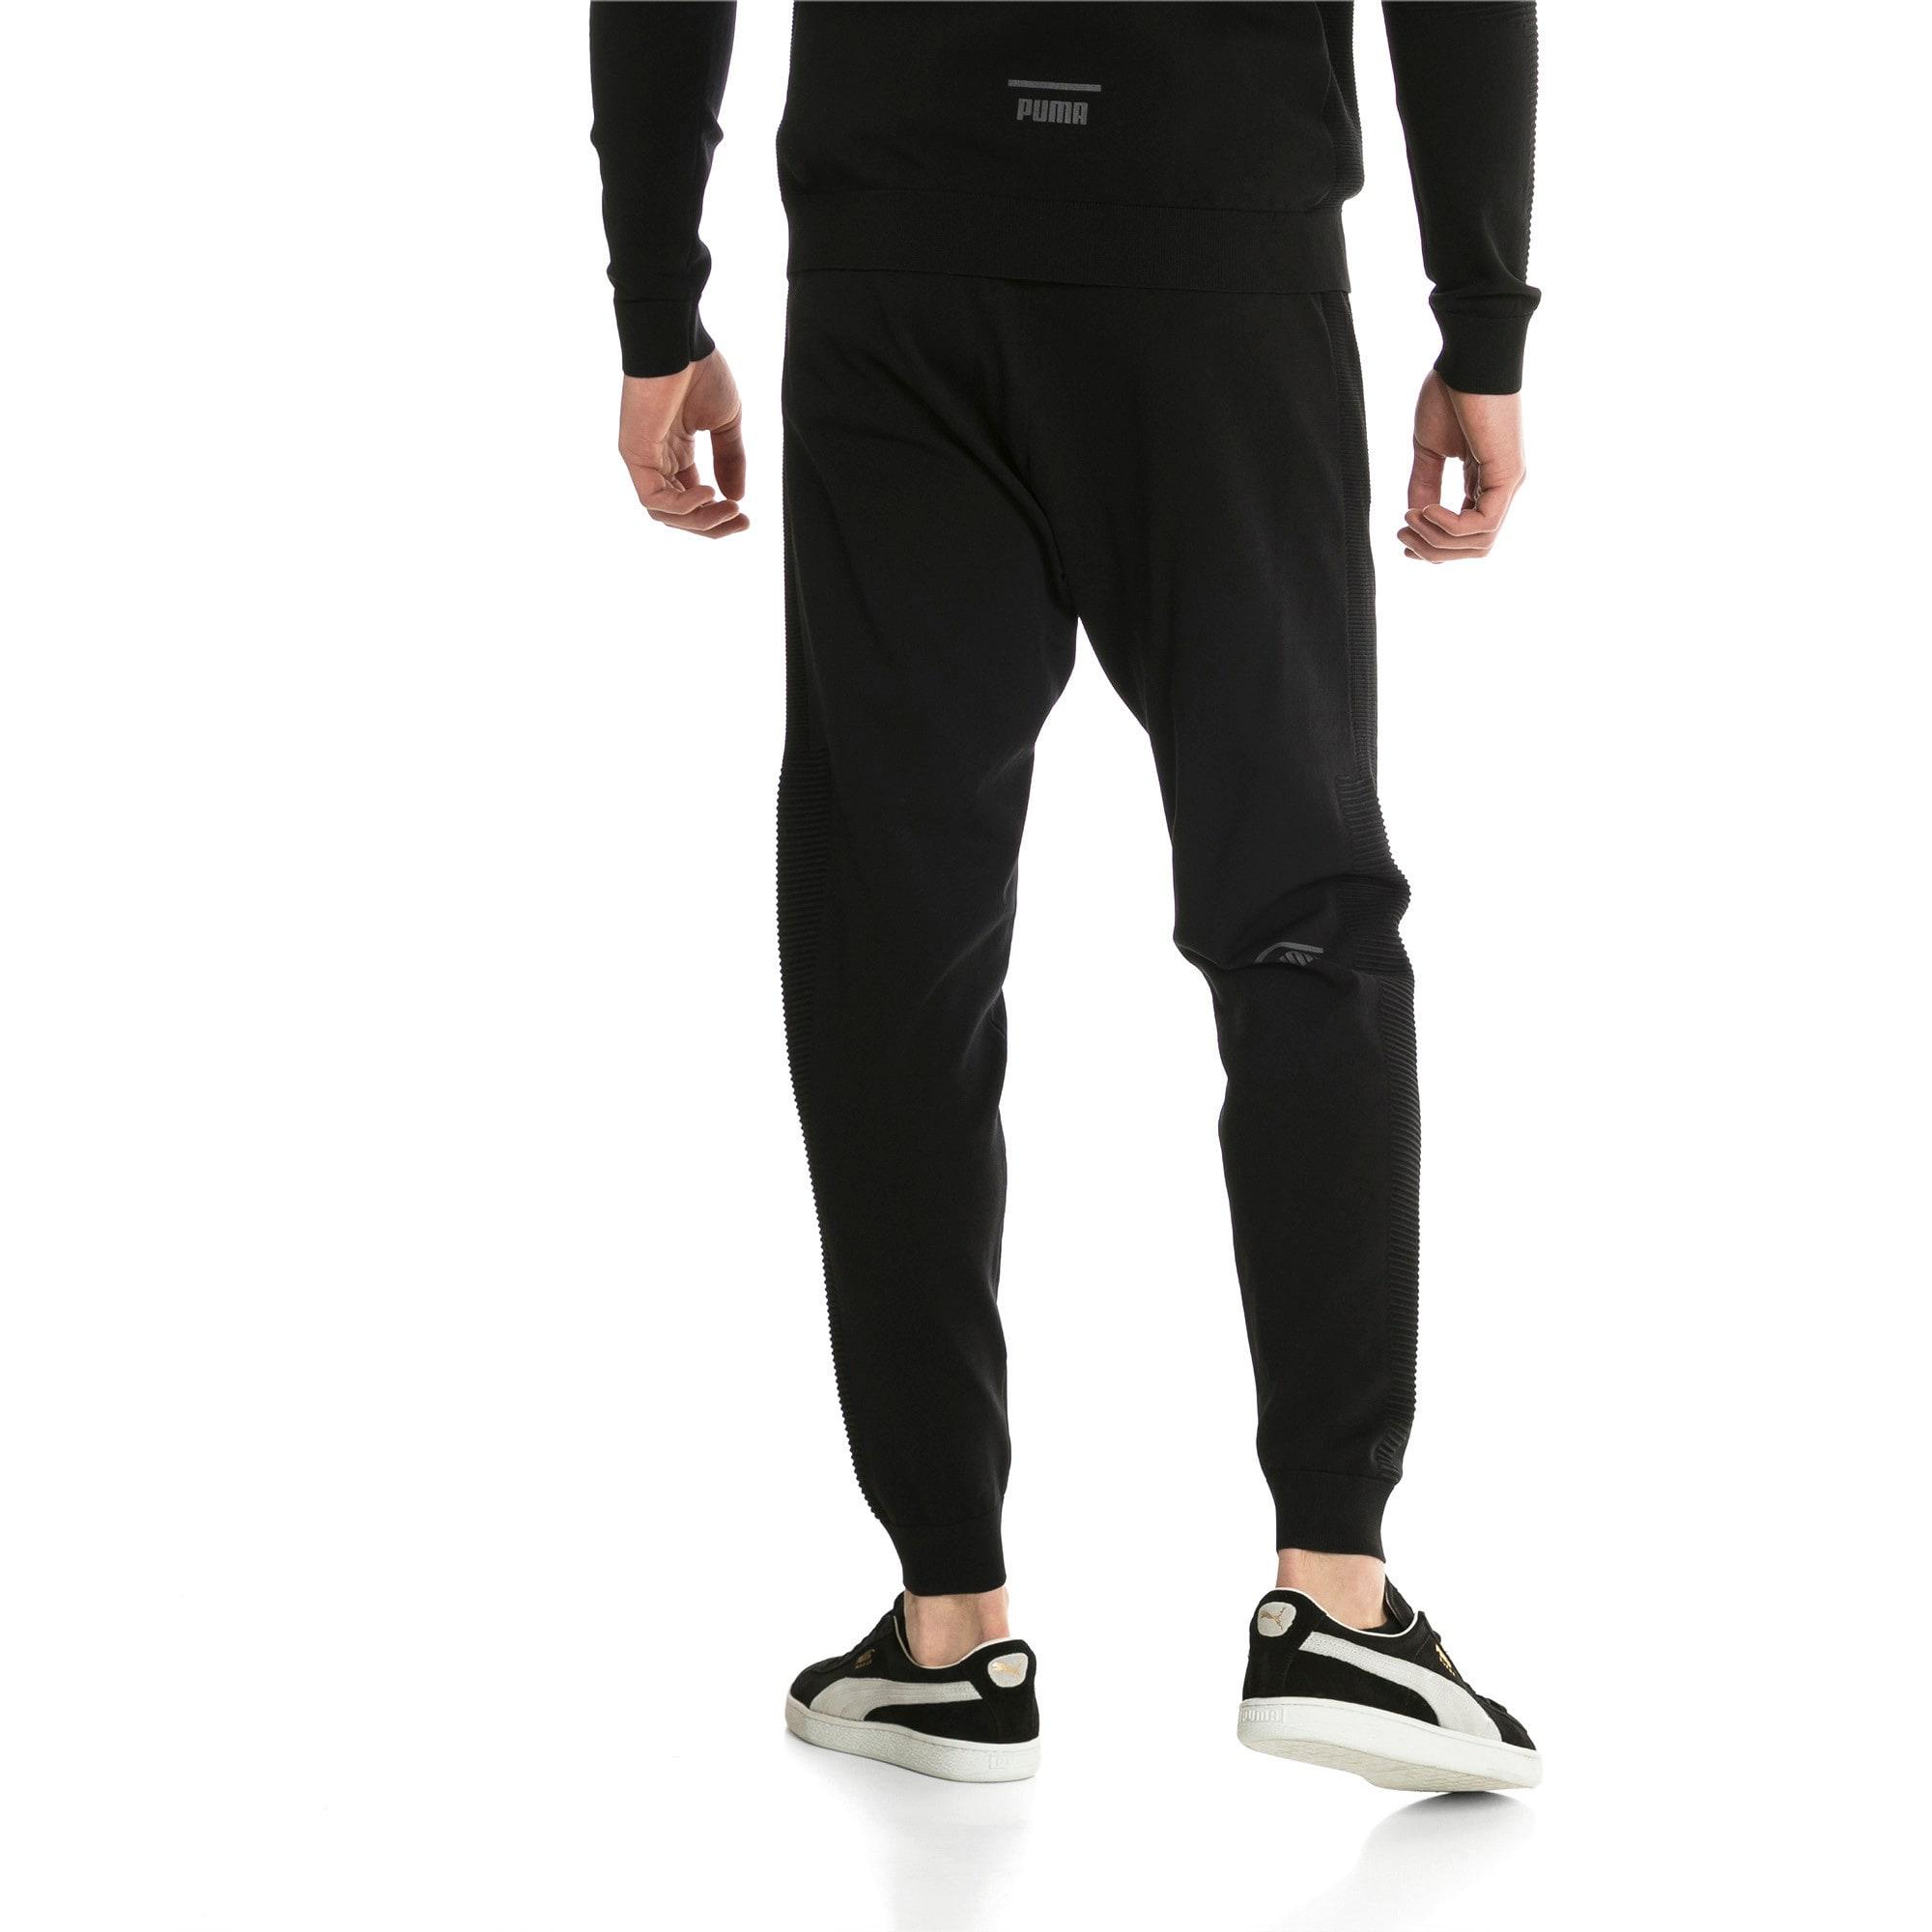 Thumbnail 3 of Pace evoKNIT Move Men's Sweatpants, Puma Black, medium